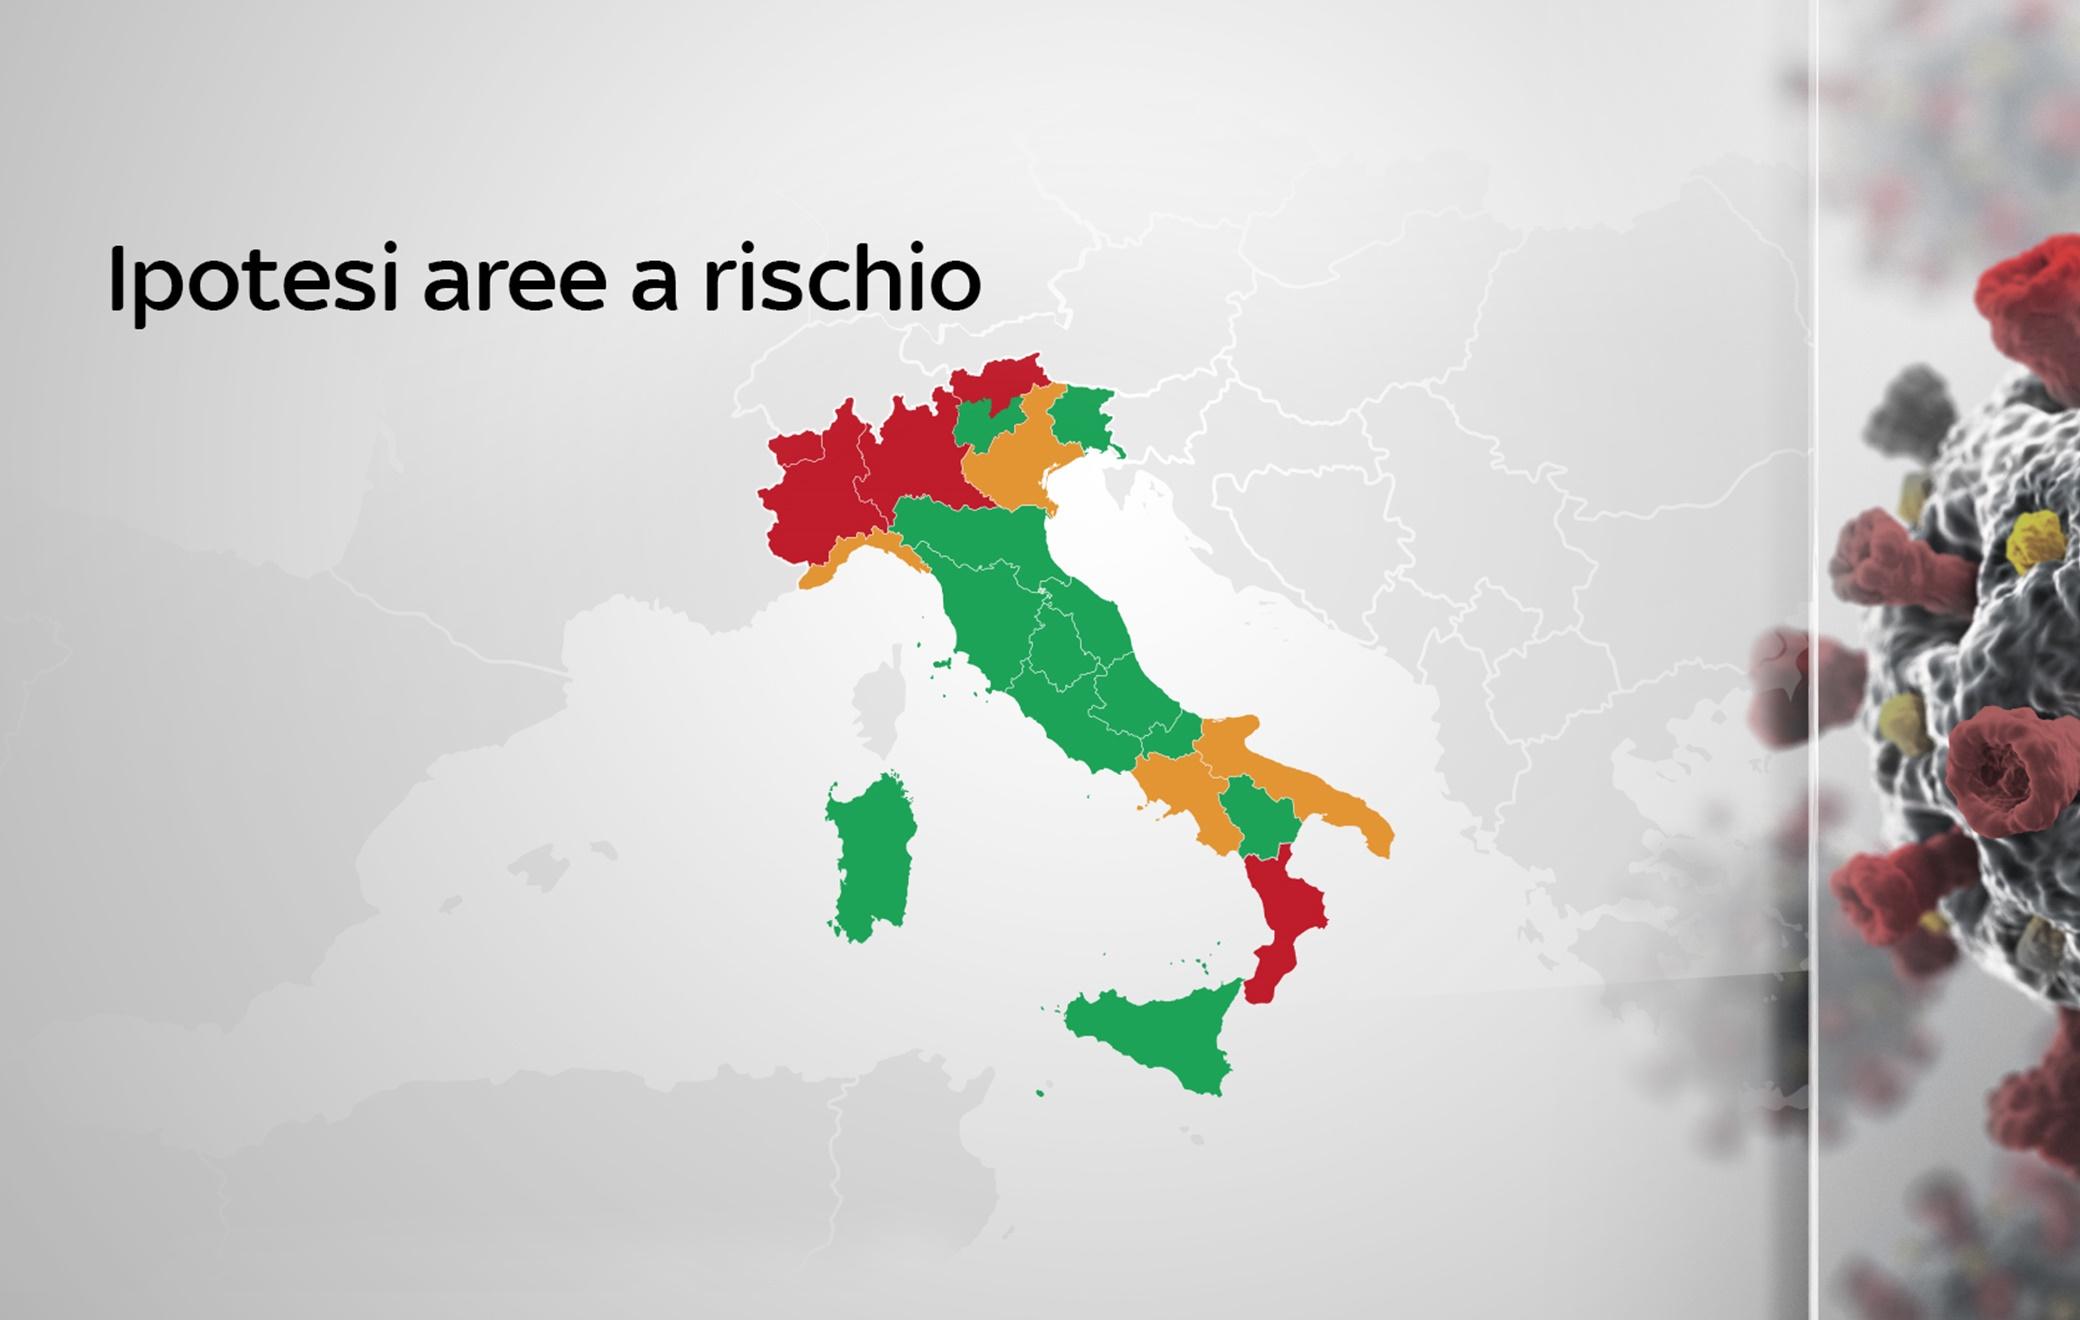 nuovo-dpcm-zona-verde-arancione-rossa-italia-ipotesi